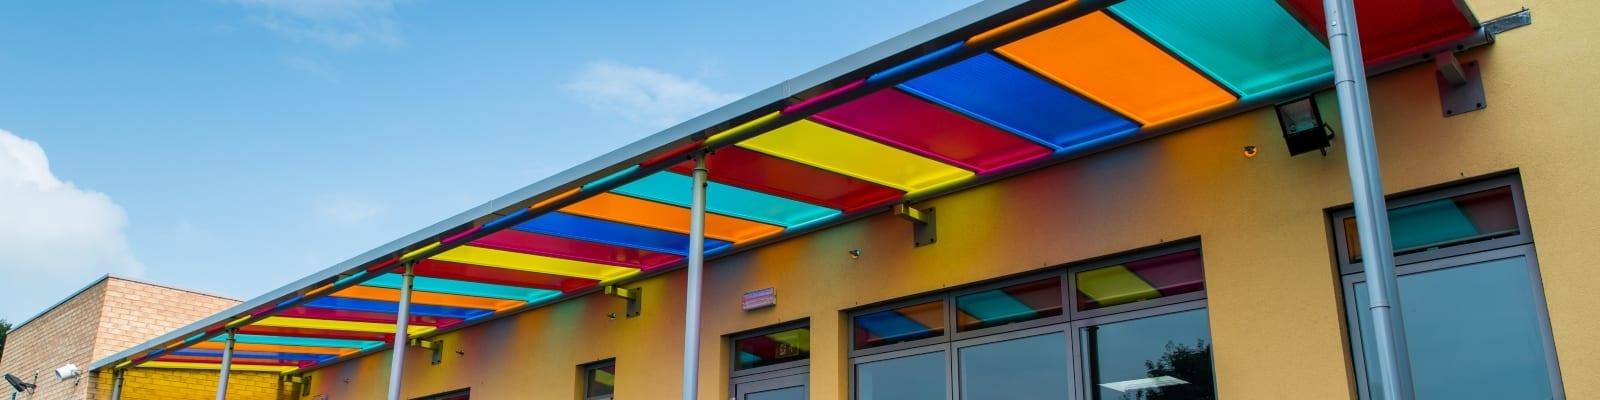 Ysgol Bro Teifi Coloured Canopies